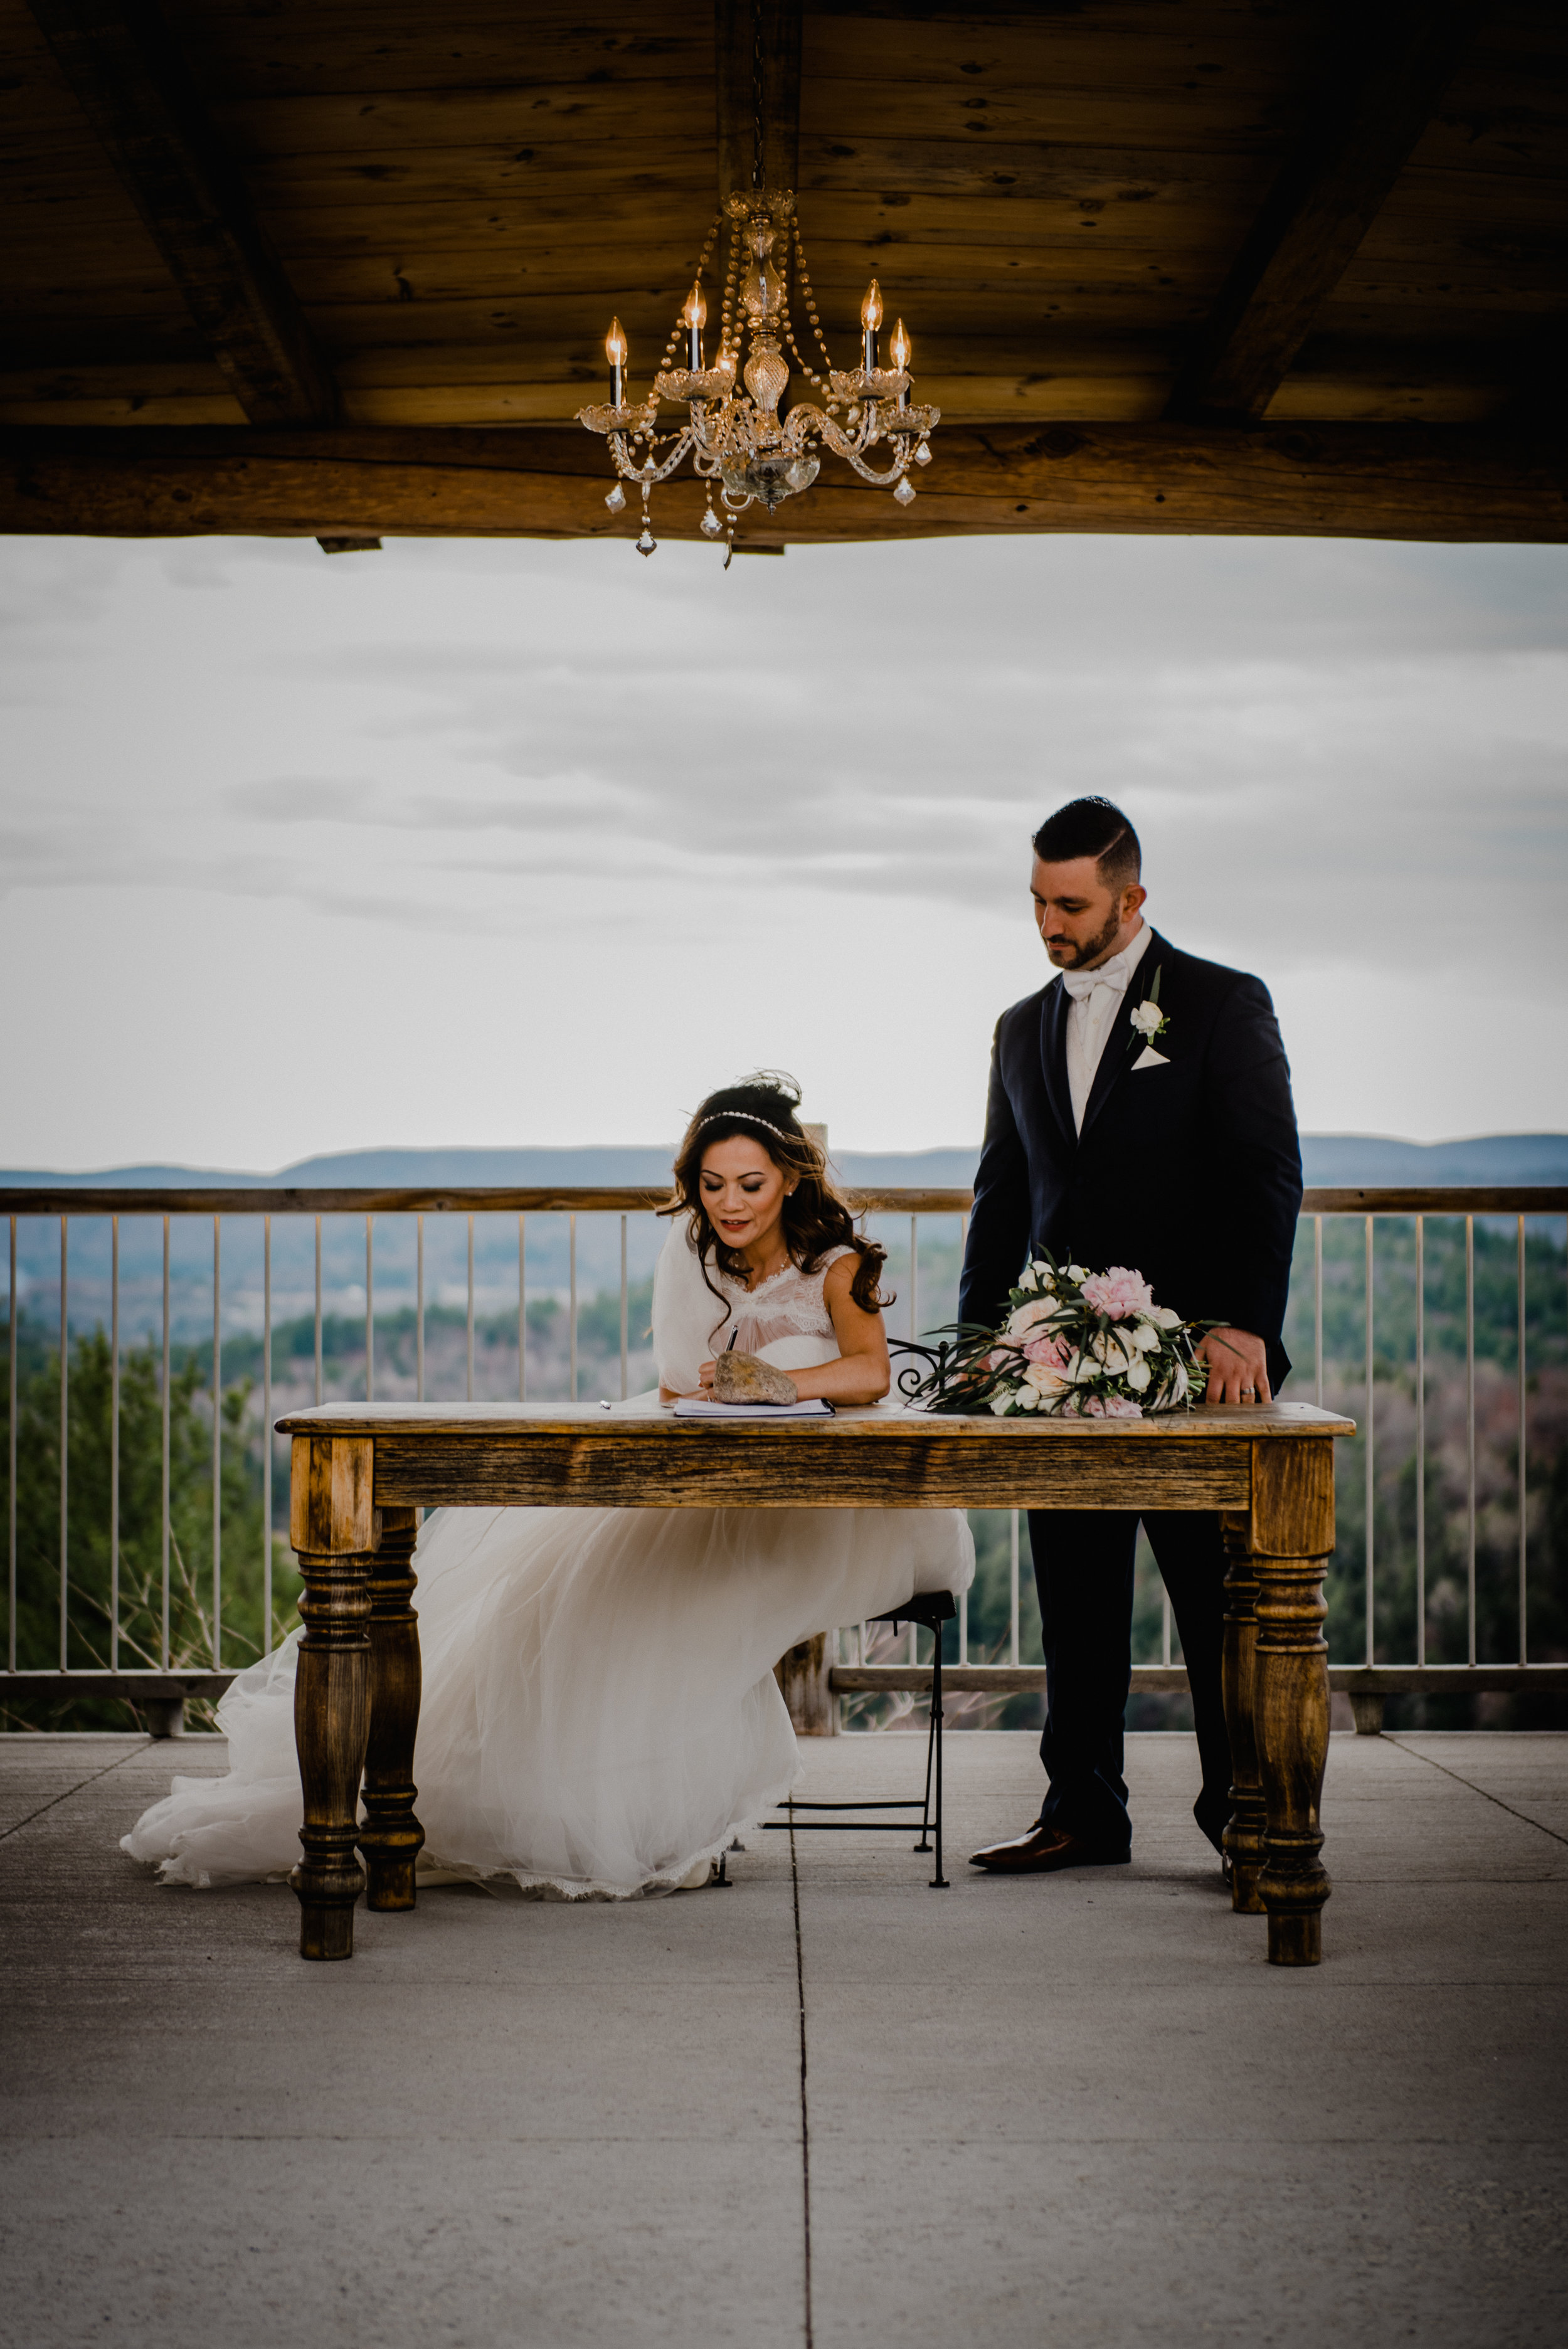 e Belvedere, Wakefield Wedding - Ceremony 6